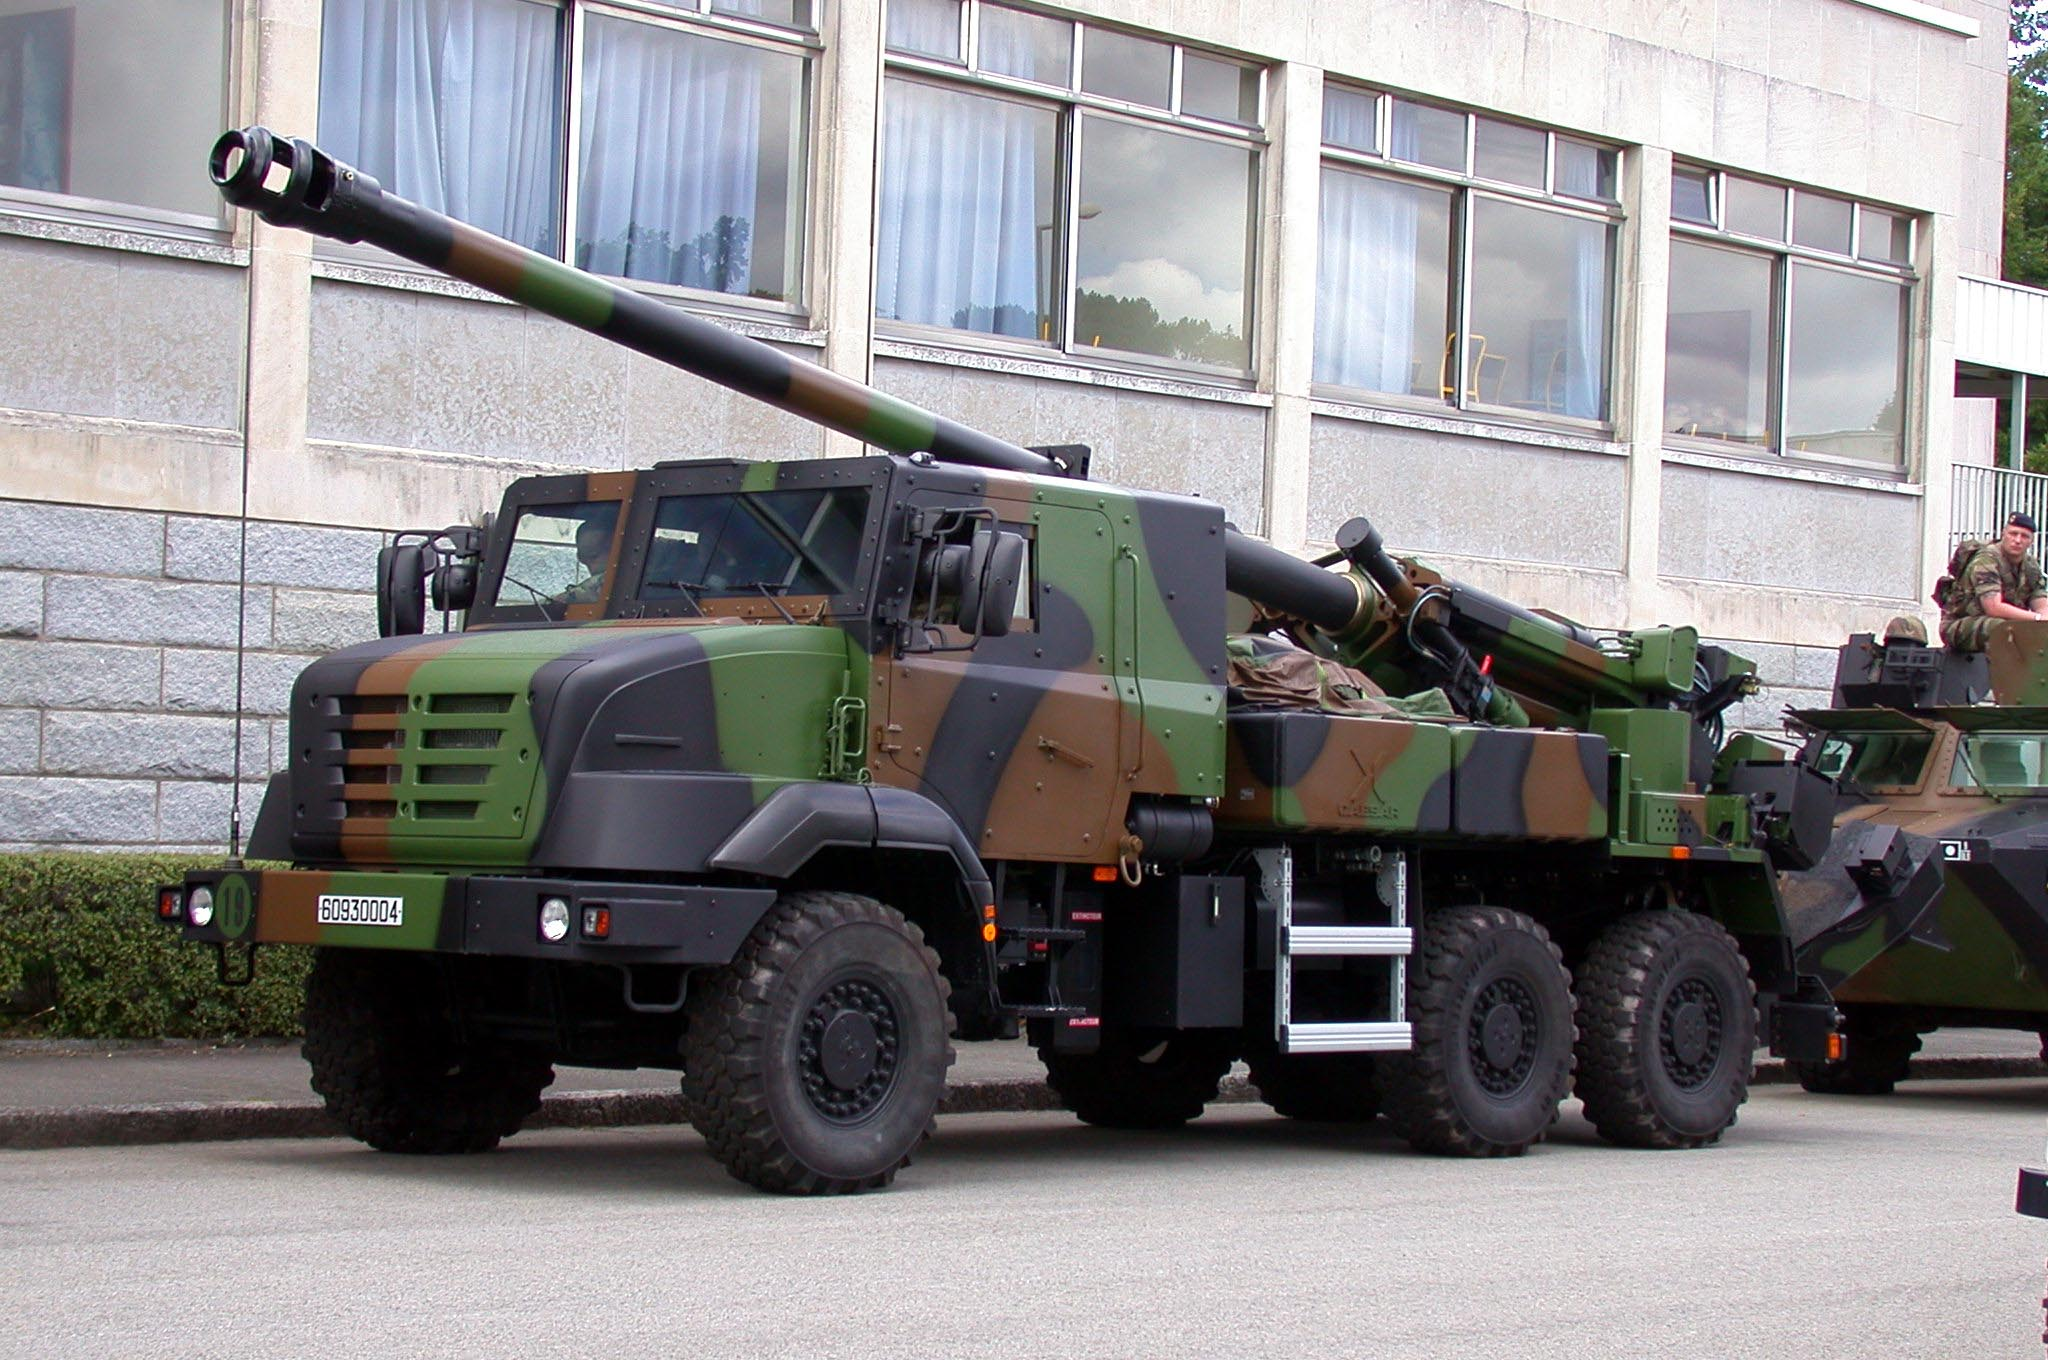 CAESAR_(camion_%C3%A9quip%C3%A9_d'un_sys